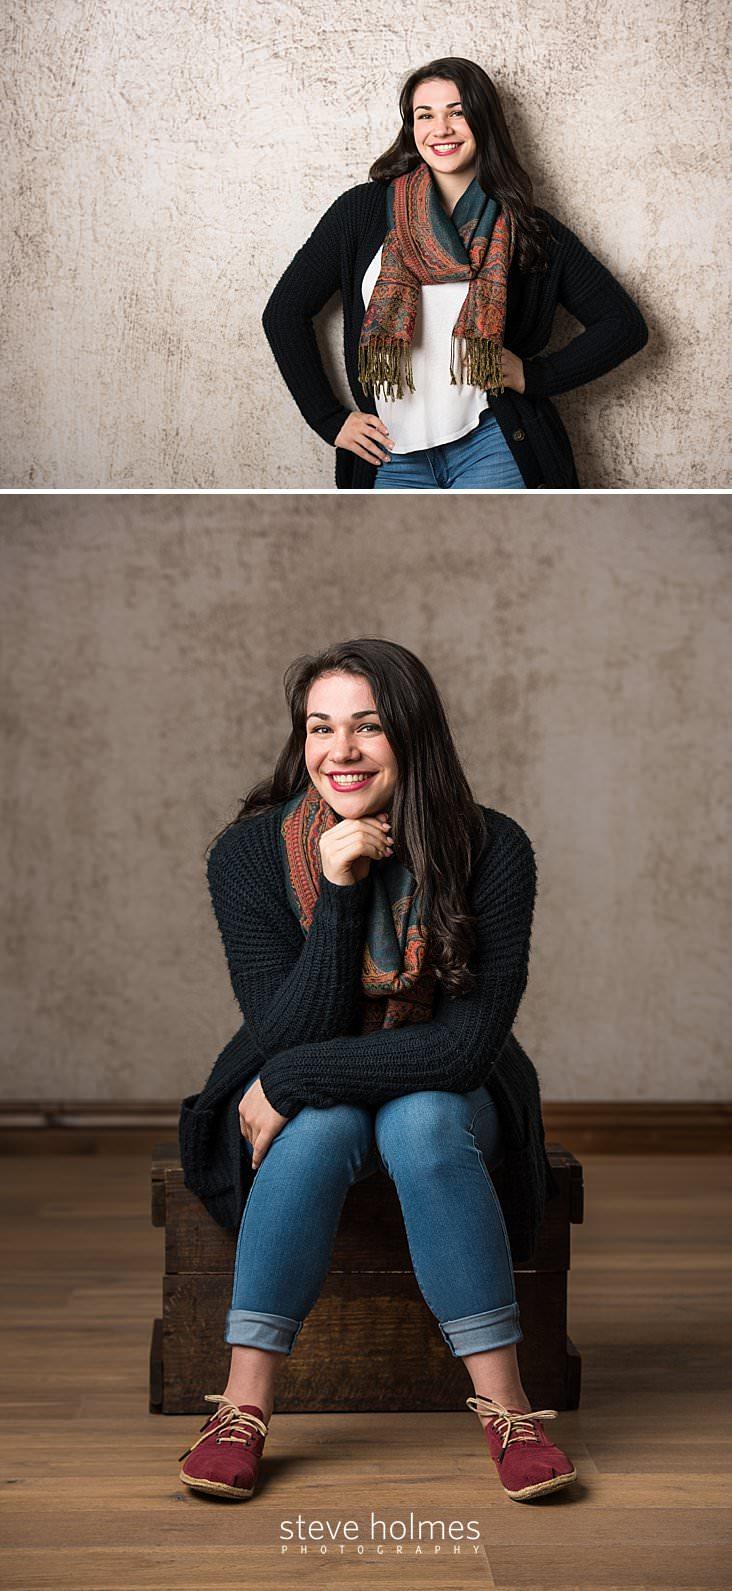 07_Teenage girl smiles wearing black sweater, scarf and jeans.jpg